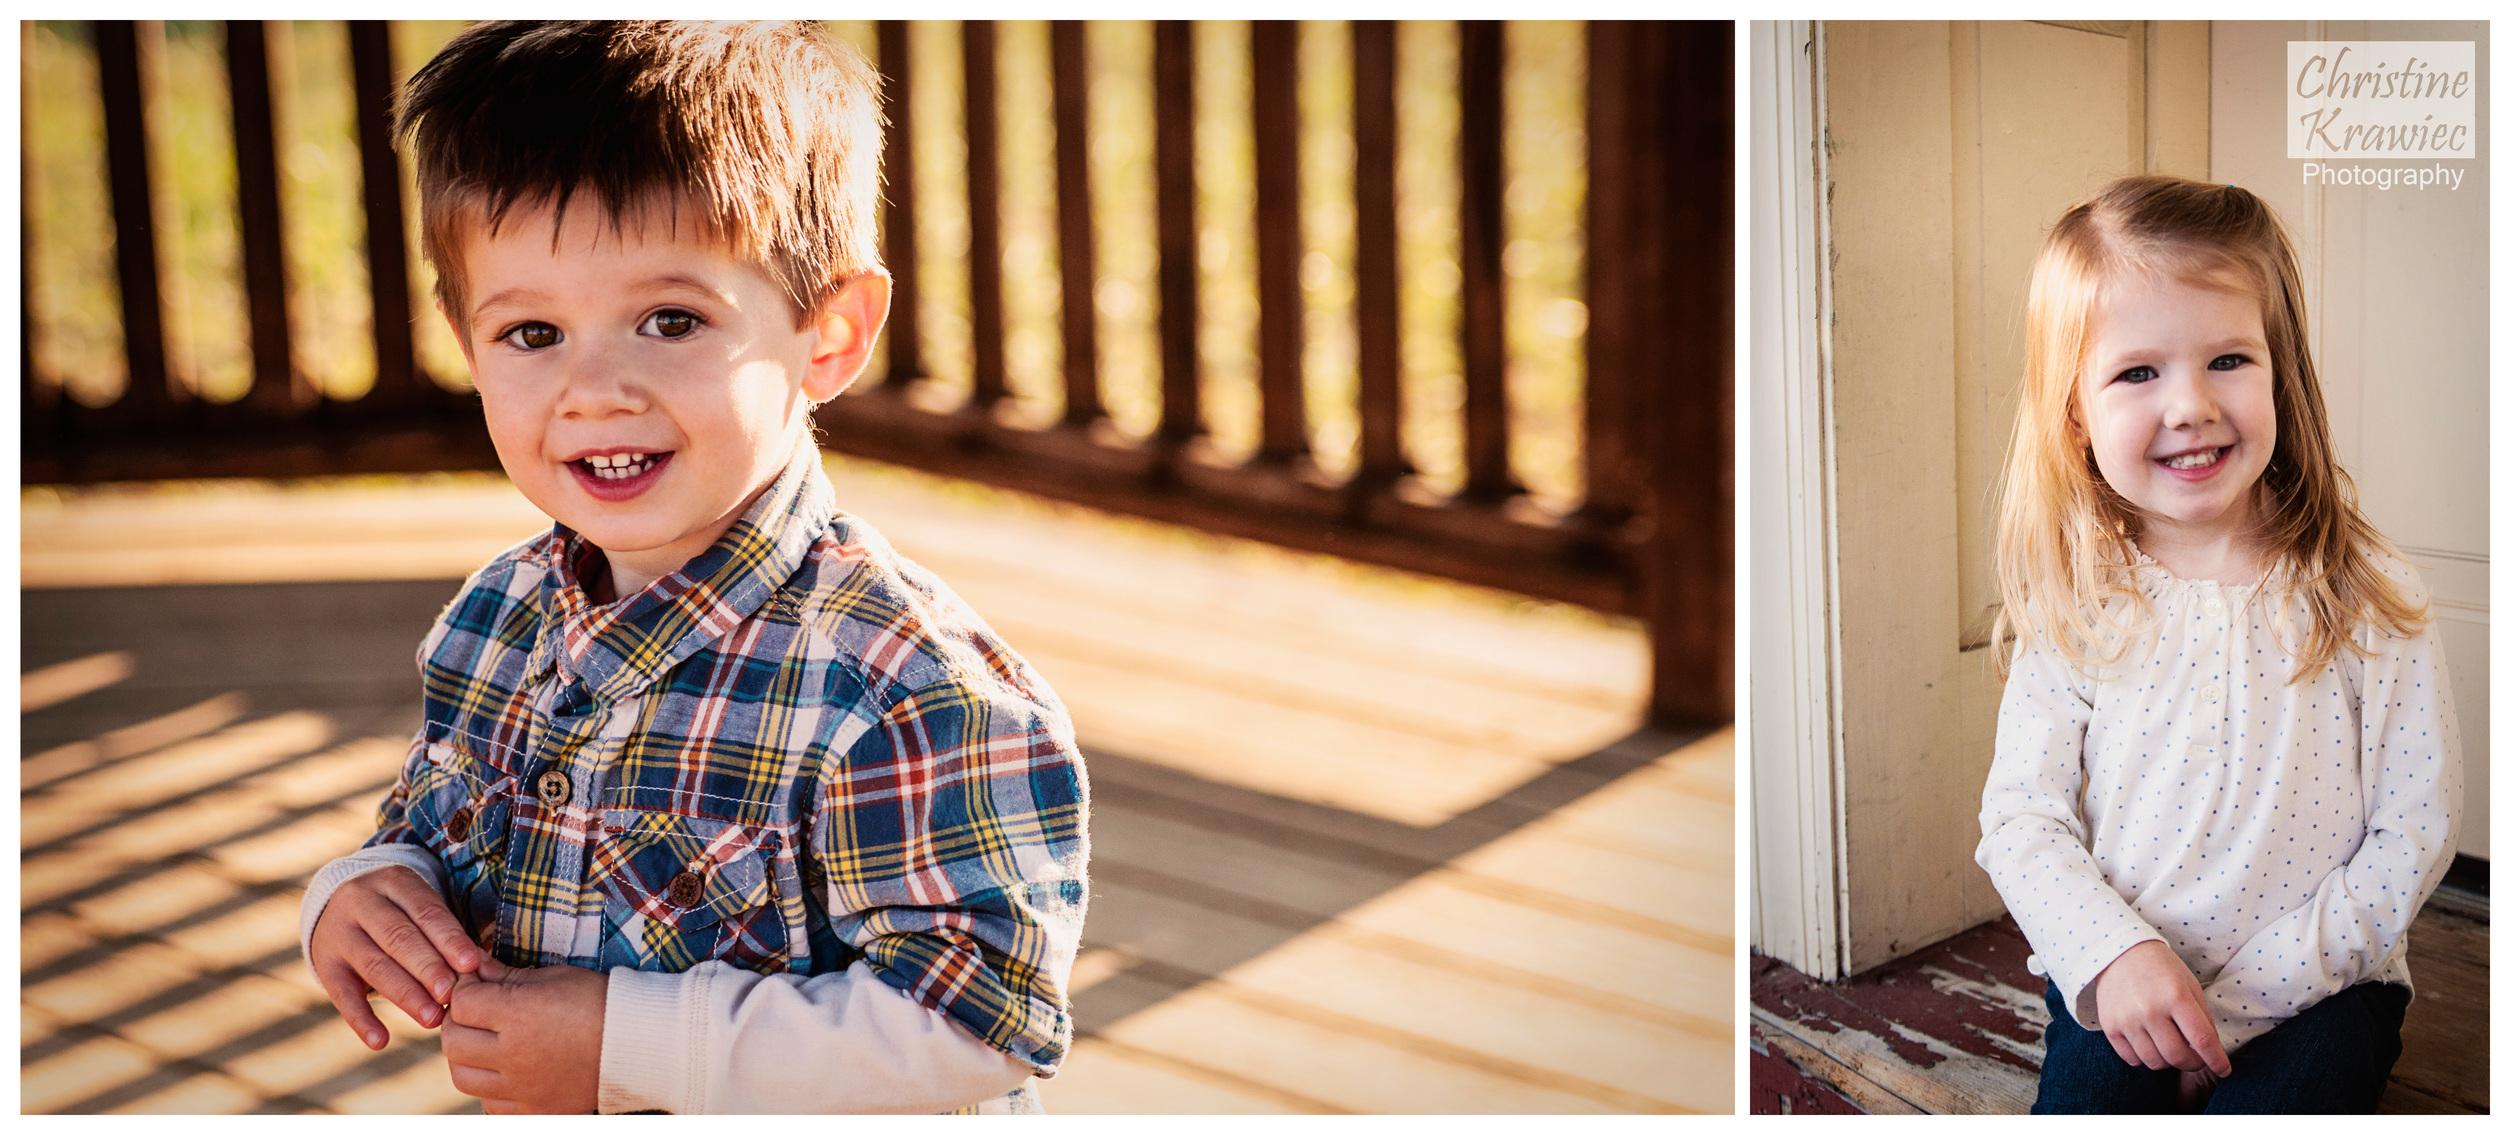 Christine KRawiec Photography - Media Family Photographer